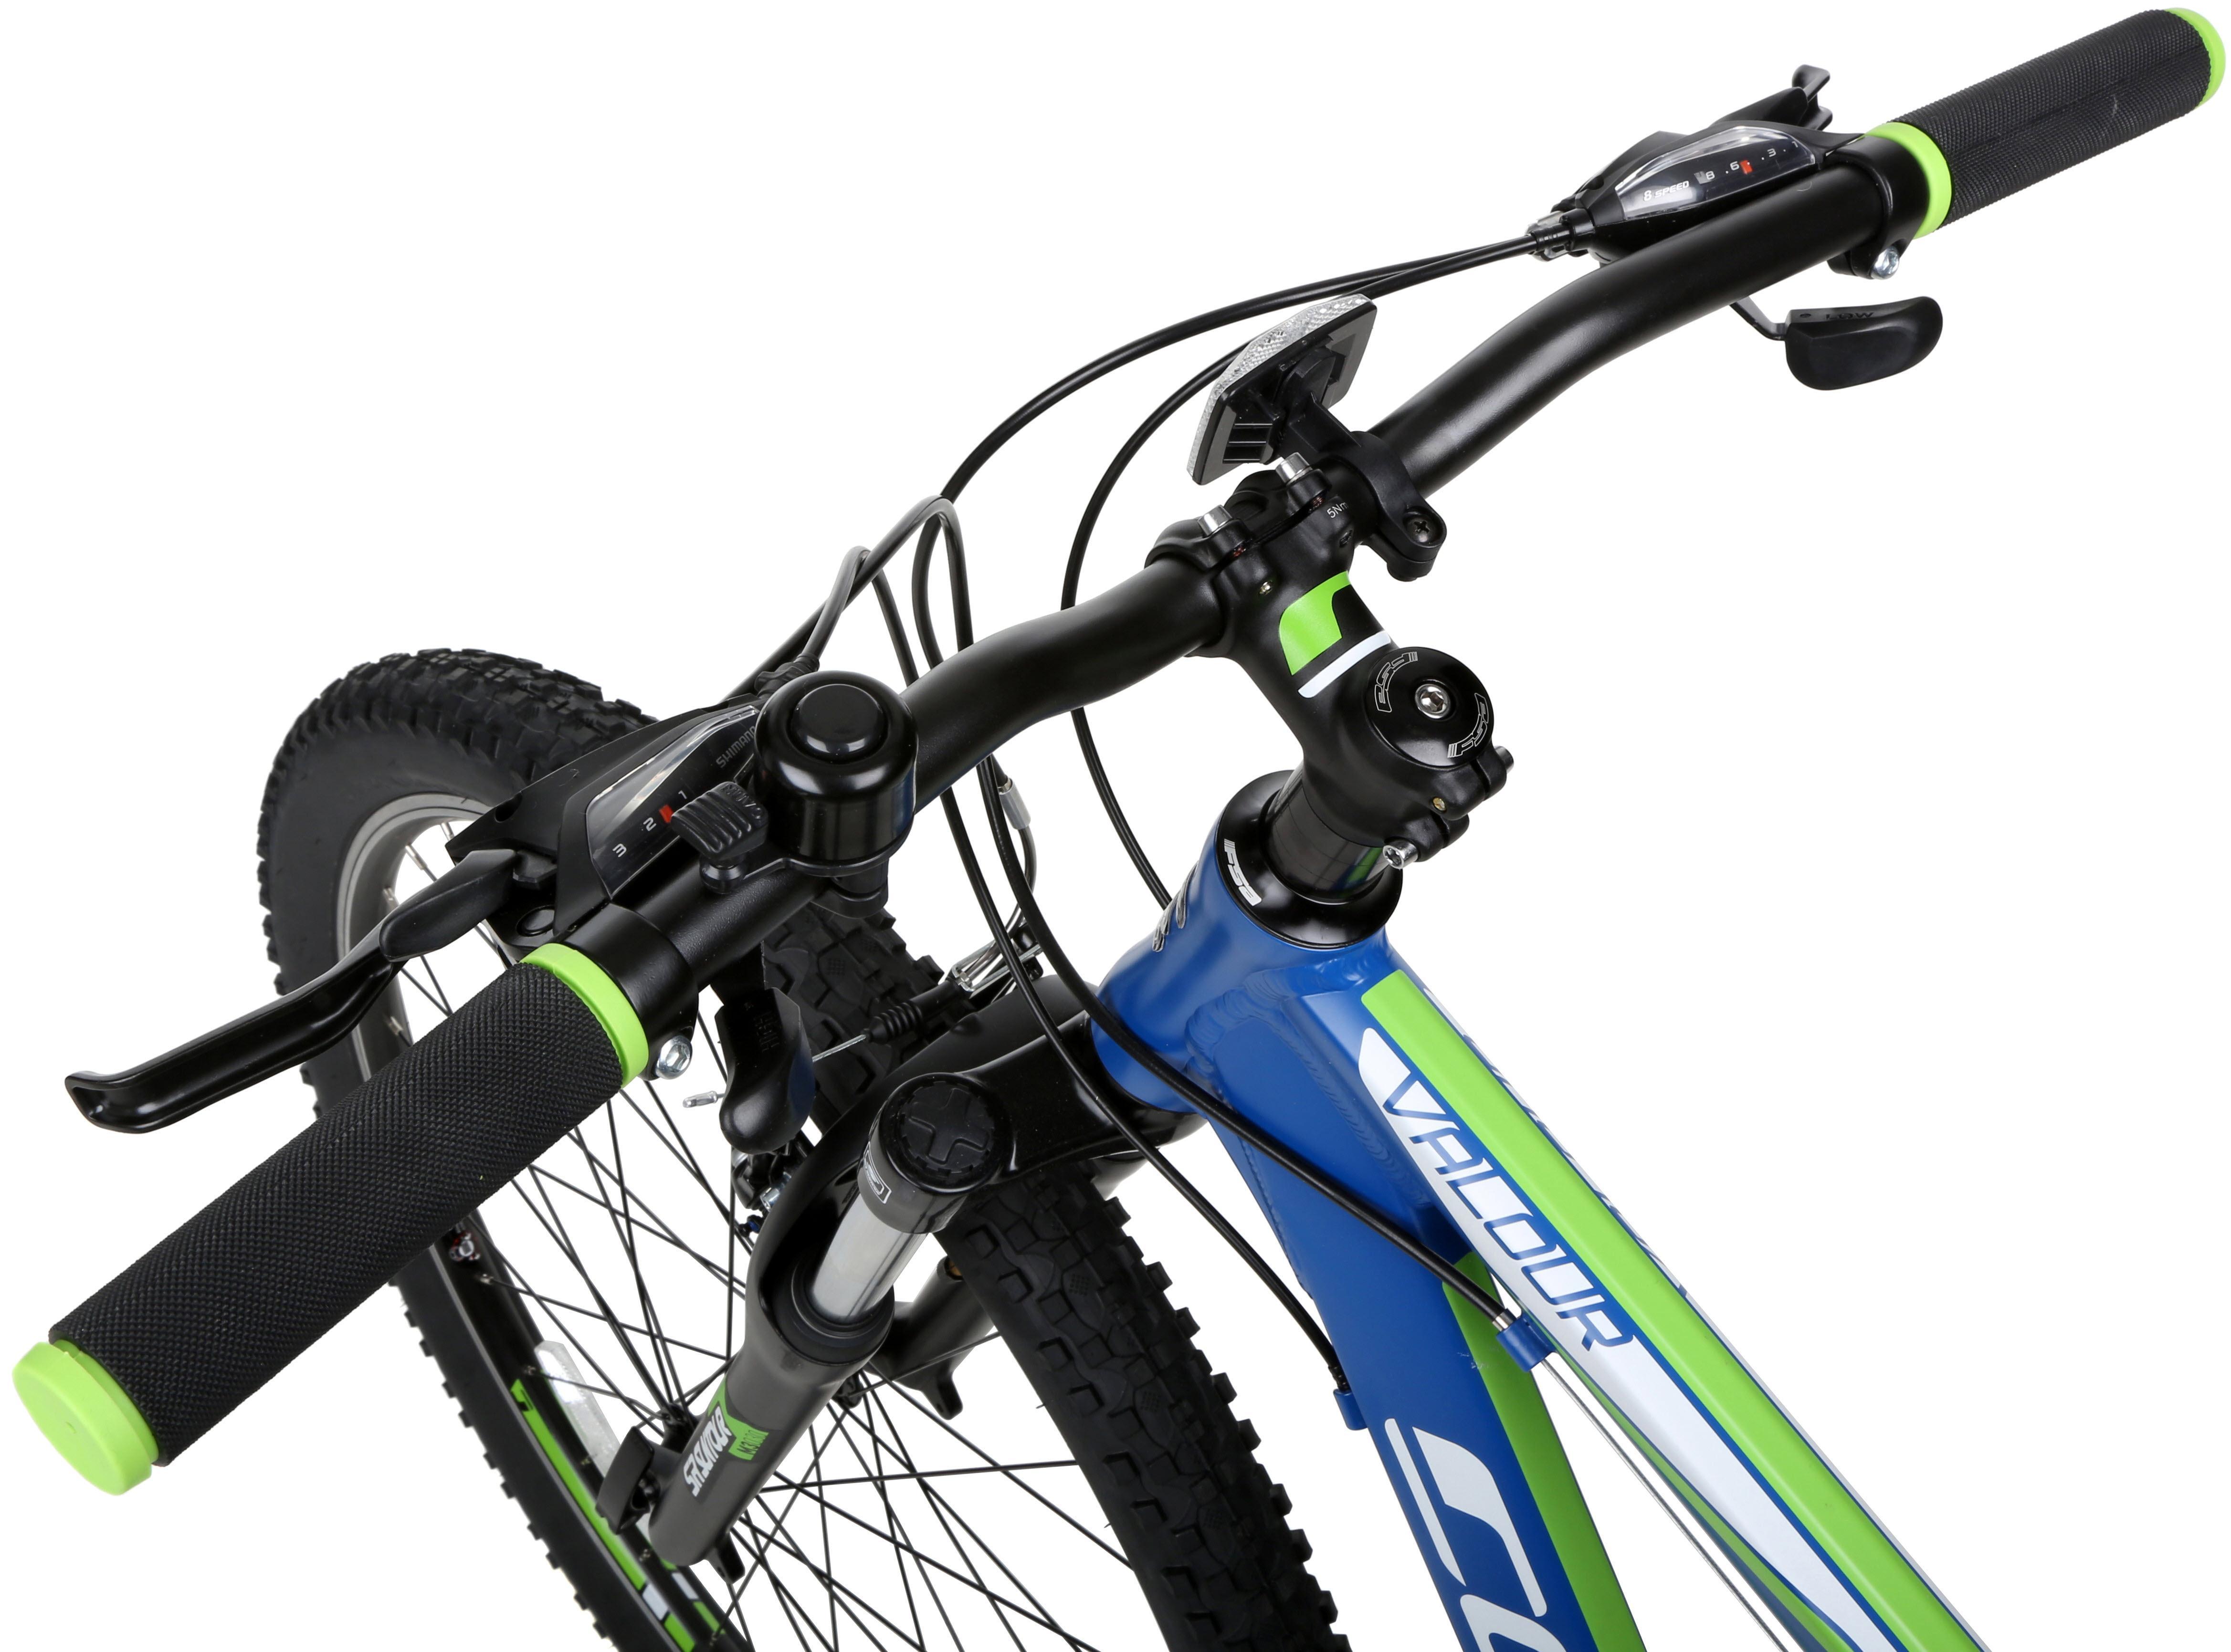 14ef6bf9381 Carrera Valour Mens MTB Mountain Bike 24 Speed Shimano Gears 27.5